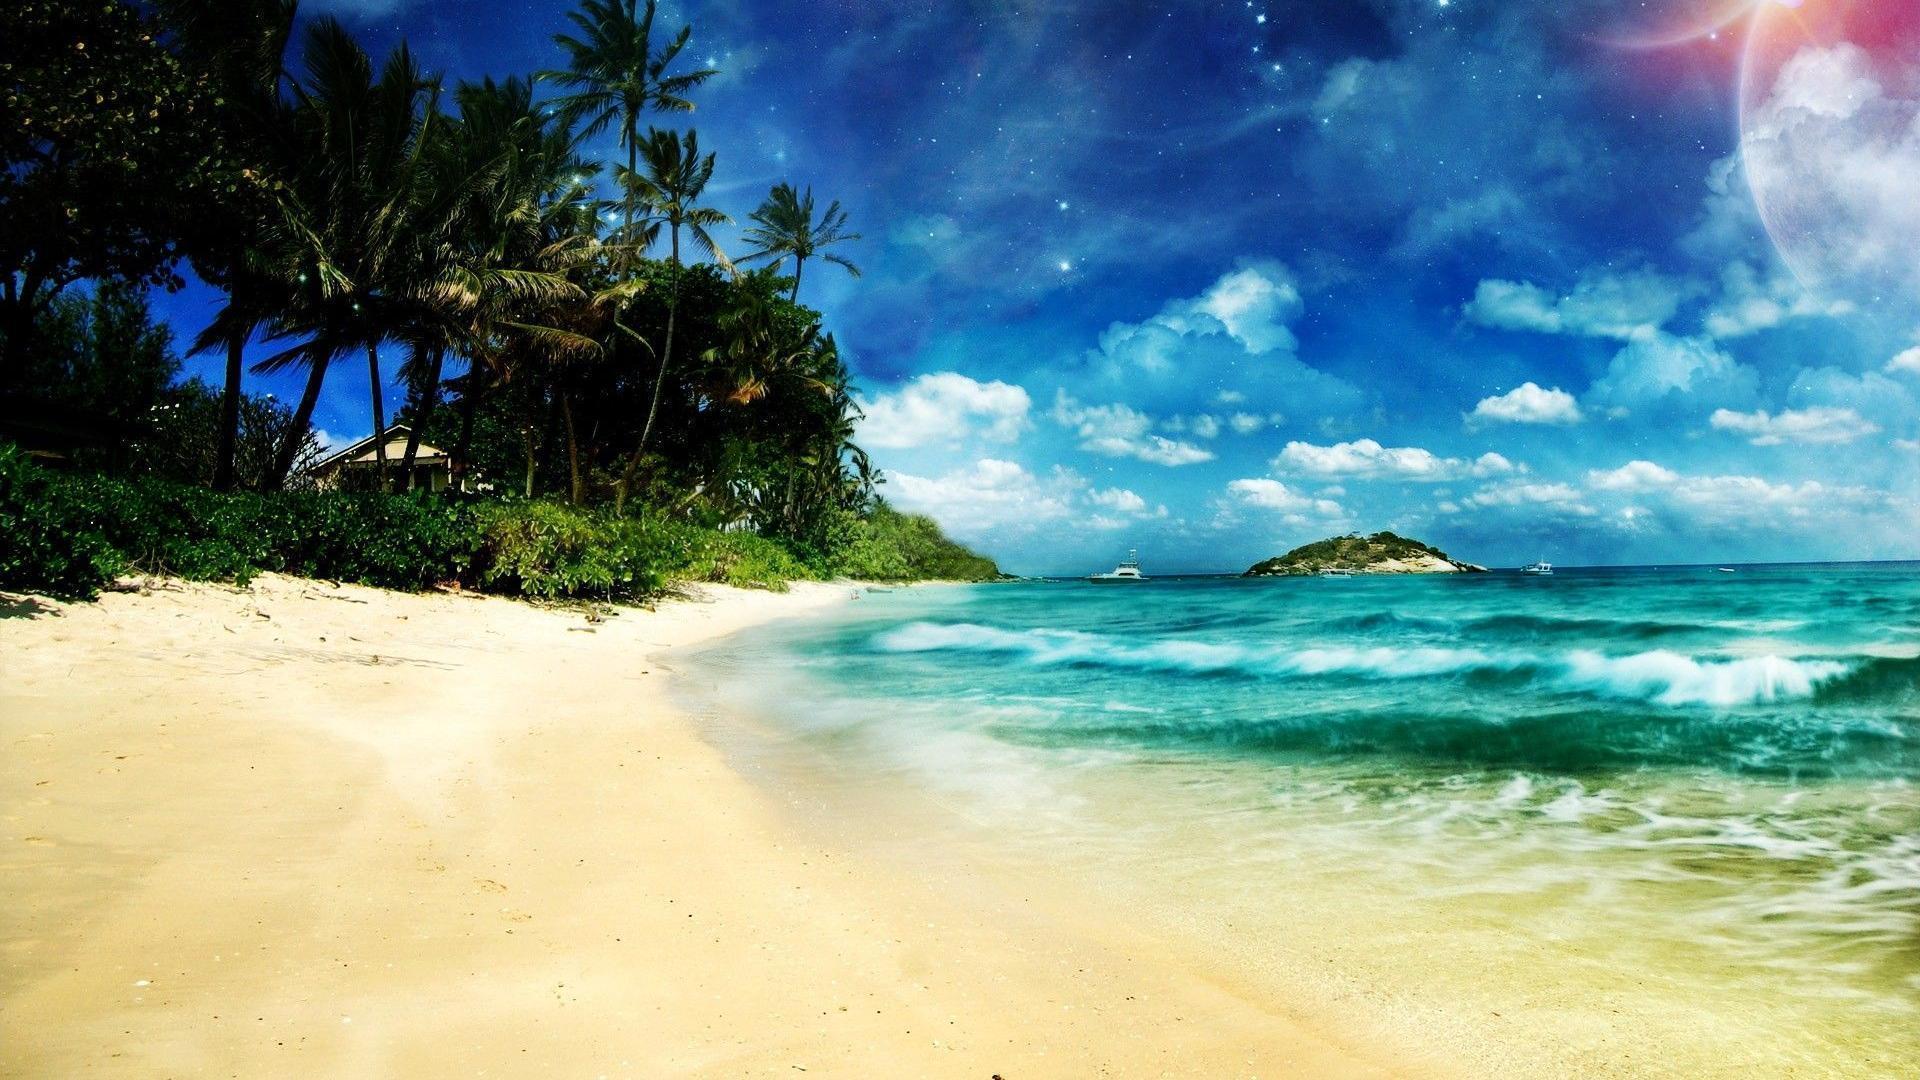 Wallpapers For Cool Beach Desktop Backgrounds